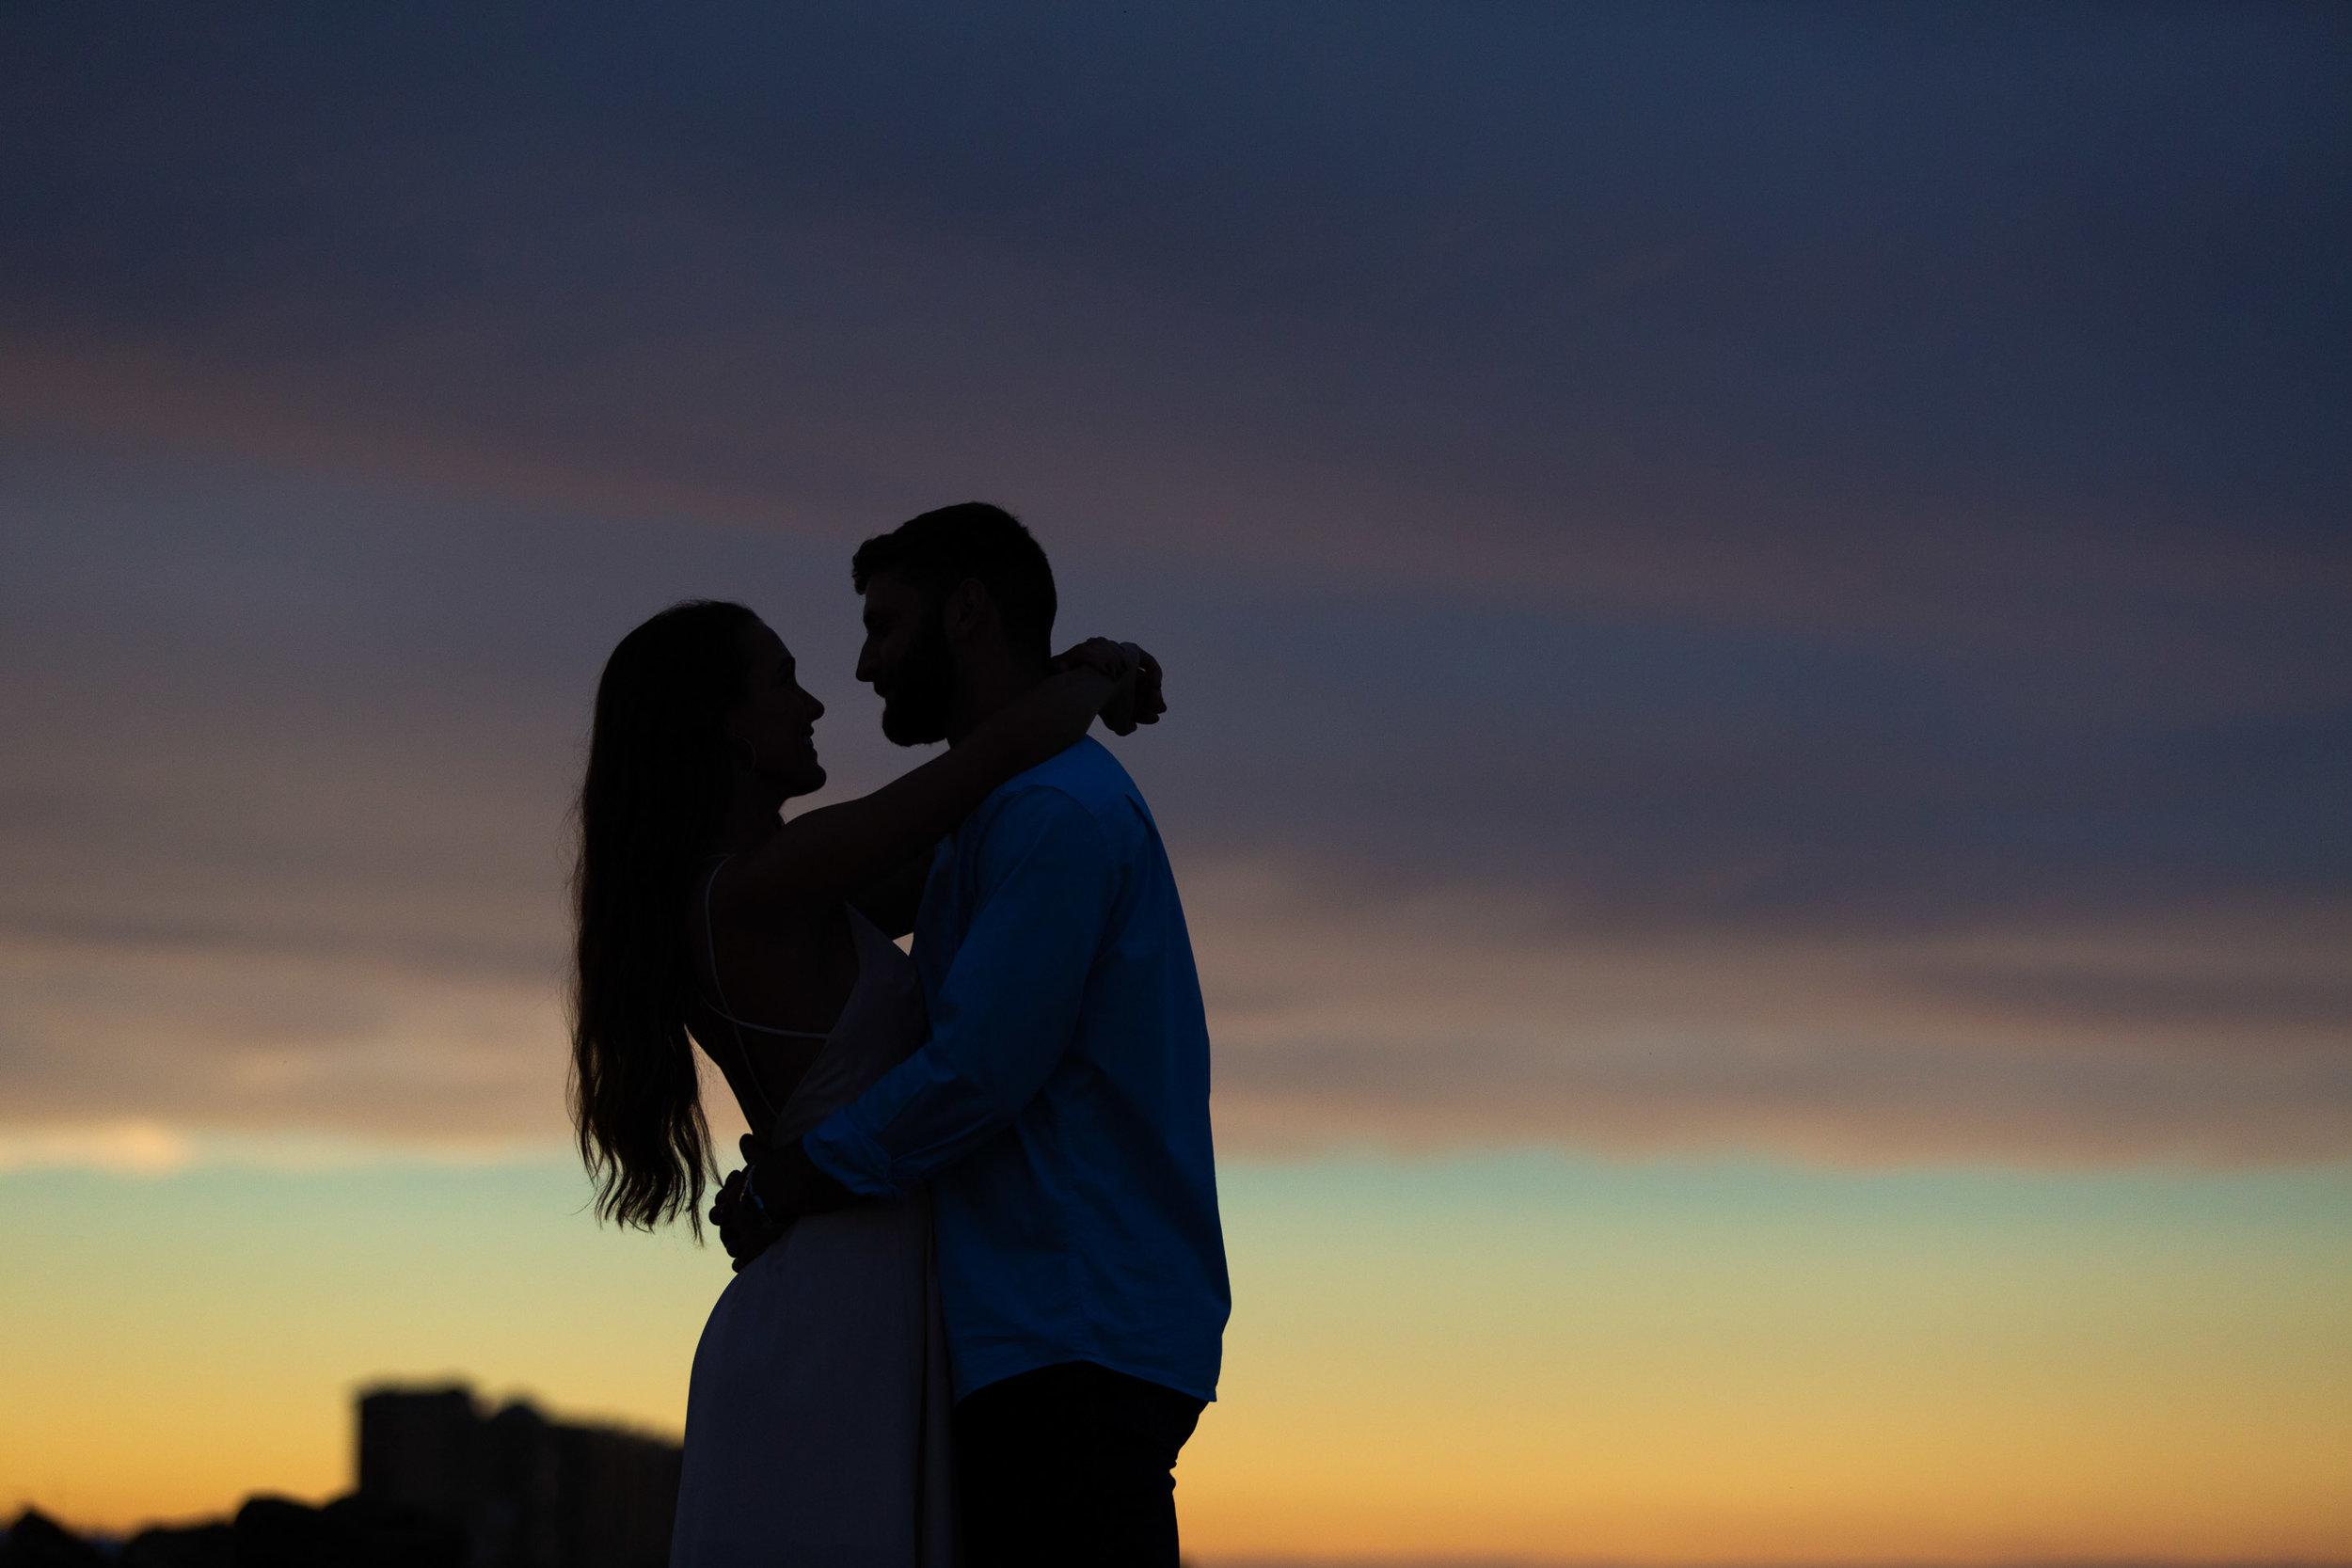 adam-szarmack-jacksonville-wedding-photographer-palm-coast-washing-oaks-garden-state-park-engagement-52.jpg